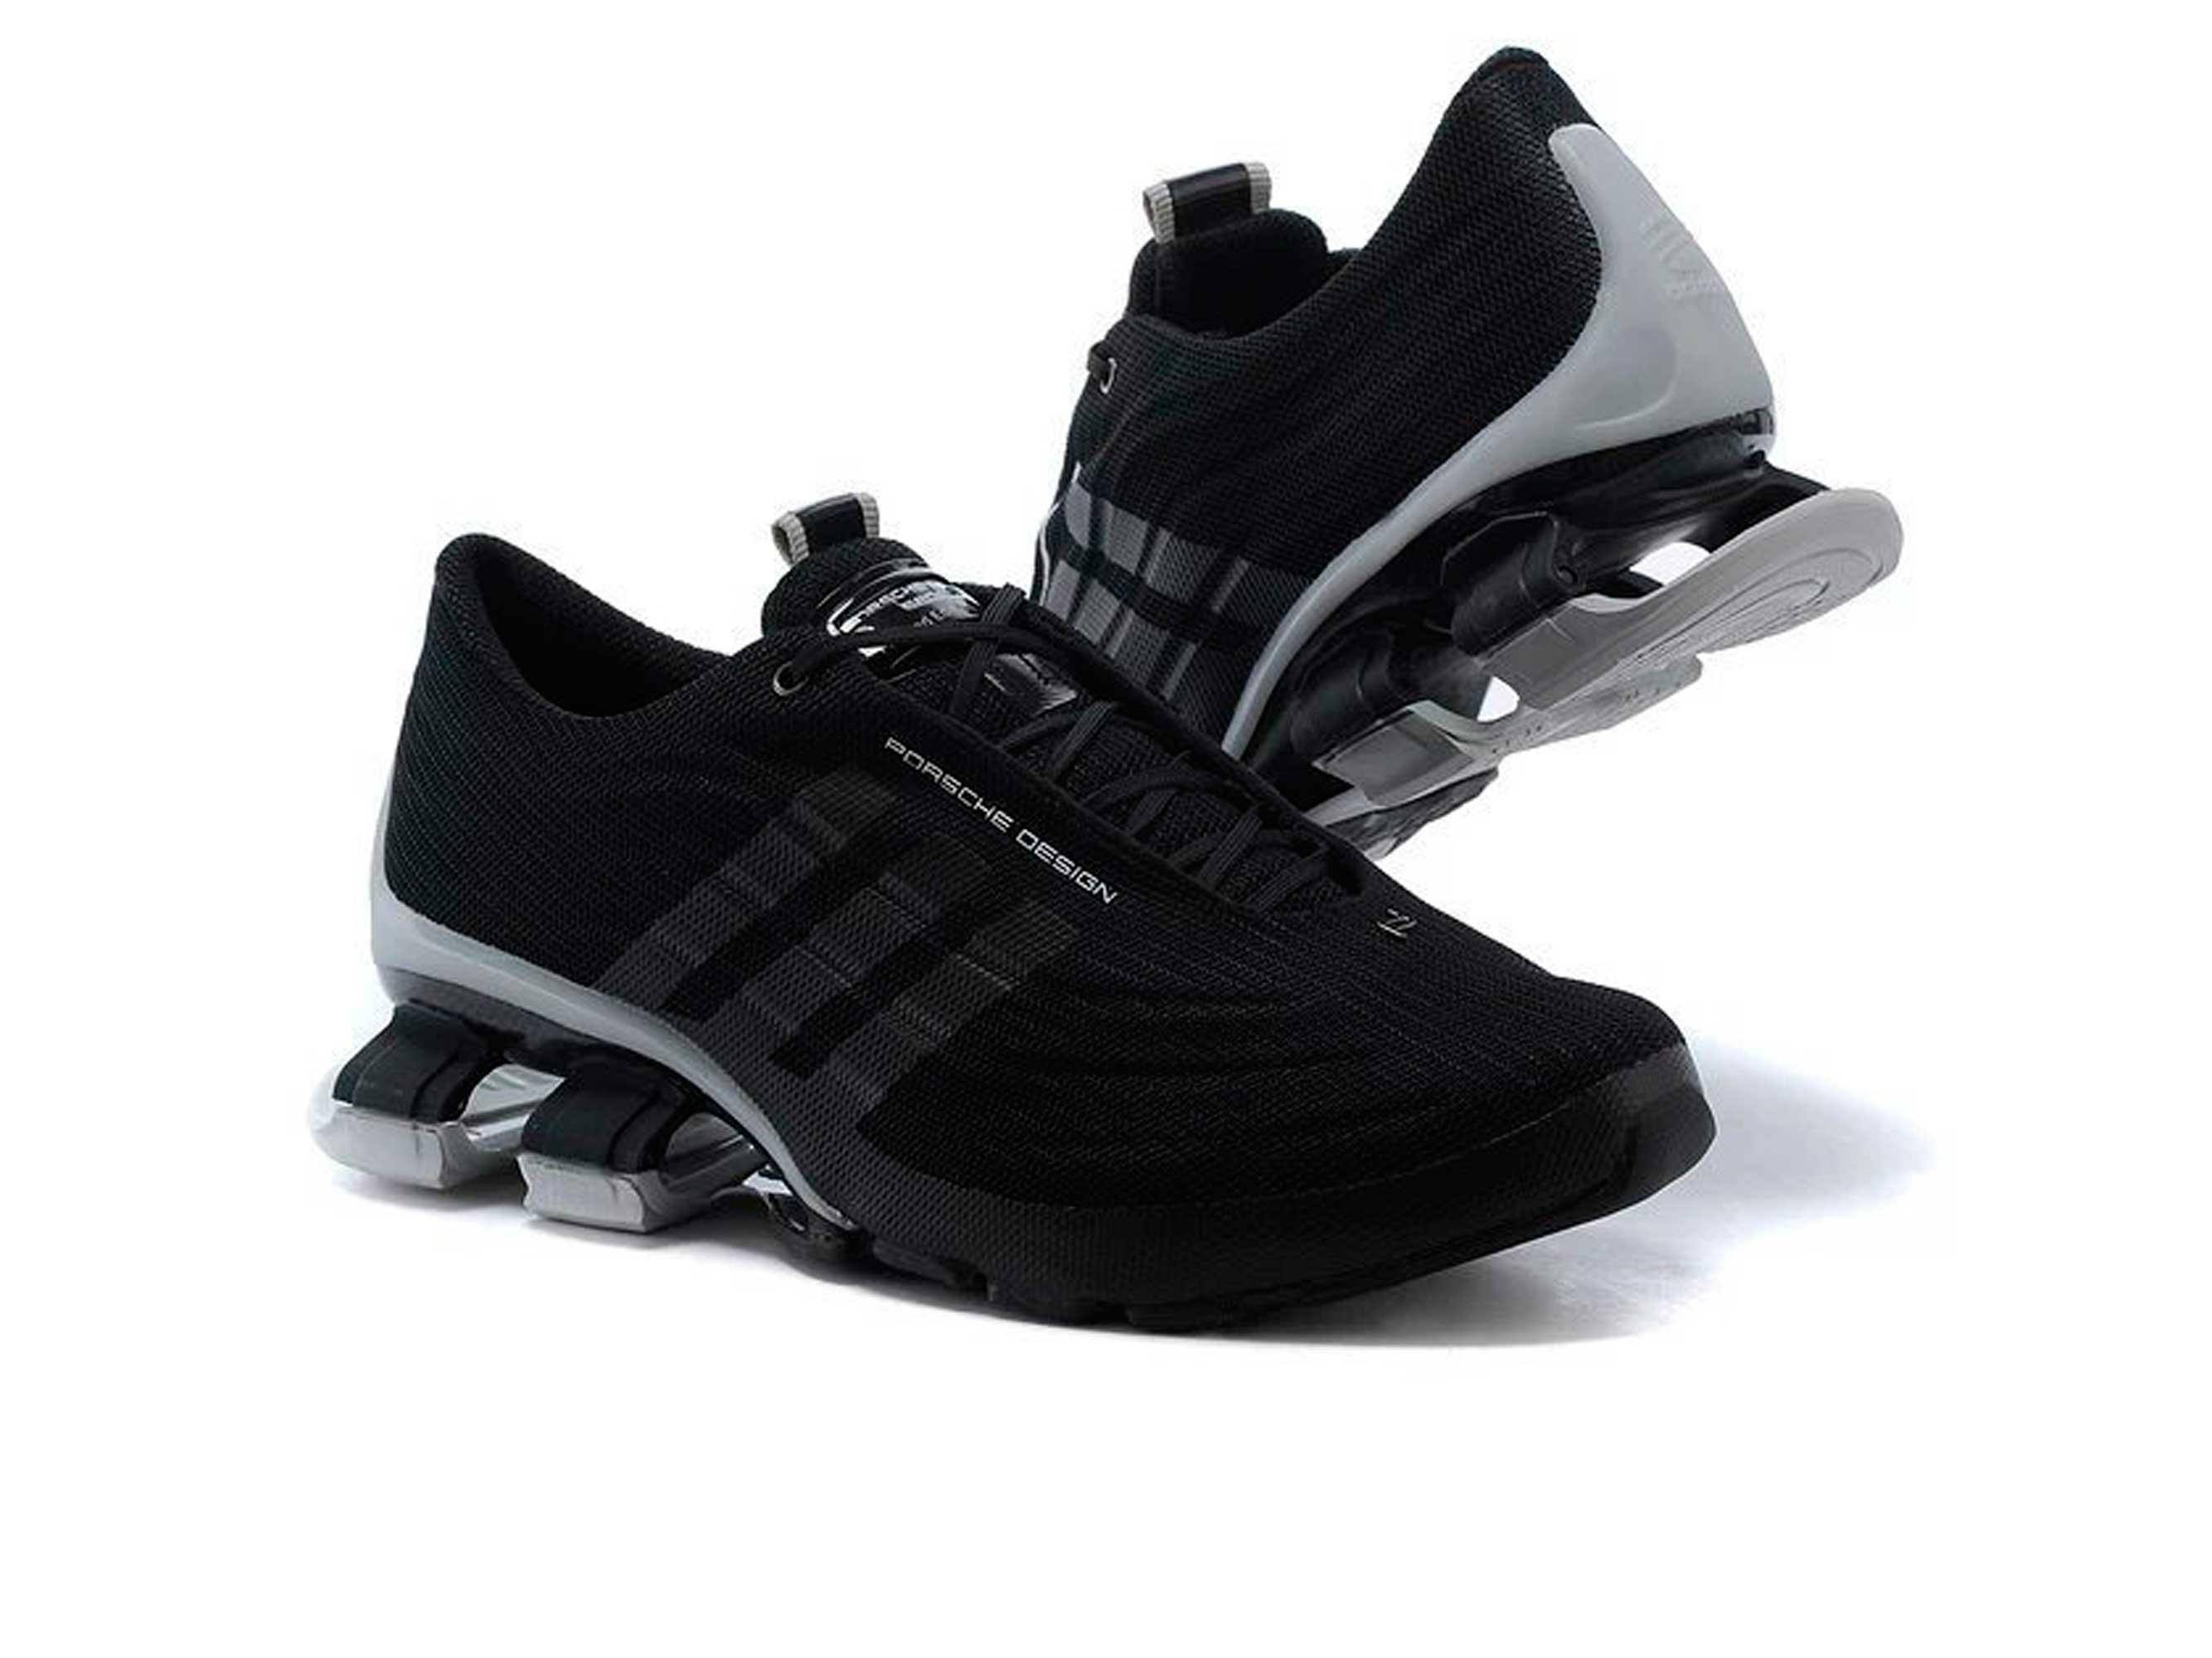 c4df52e99 ... coupon adidas porsche design bounce s4 black grey ce209 7f3dd